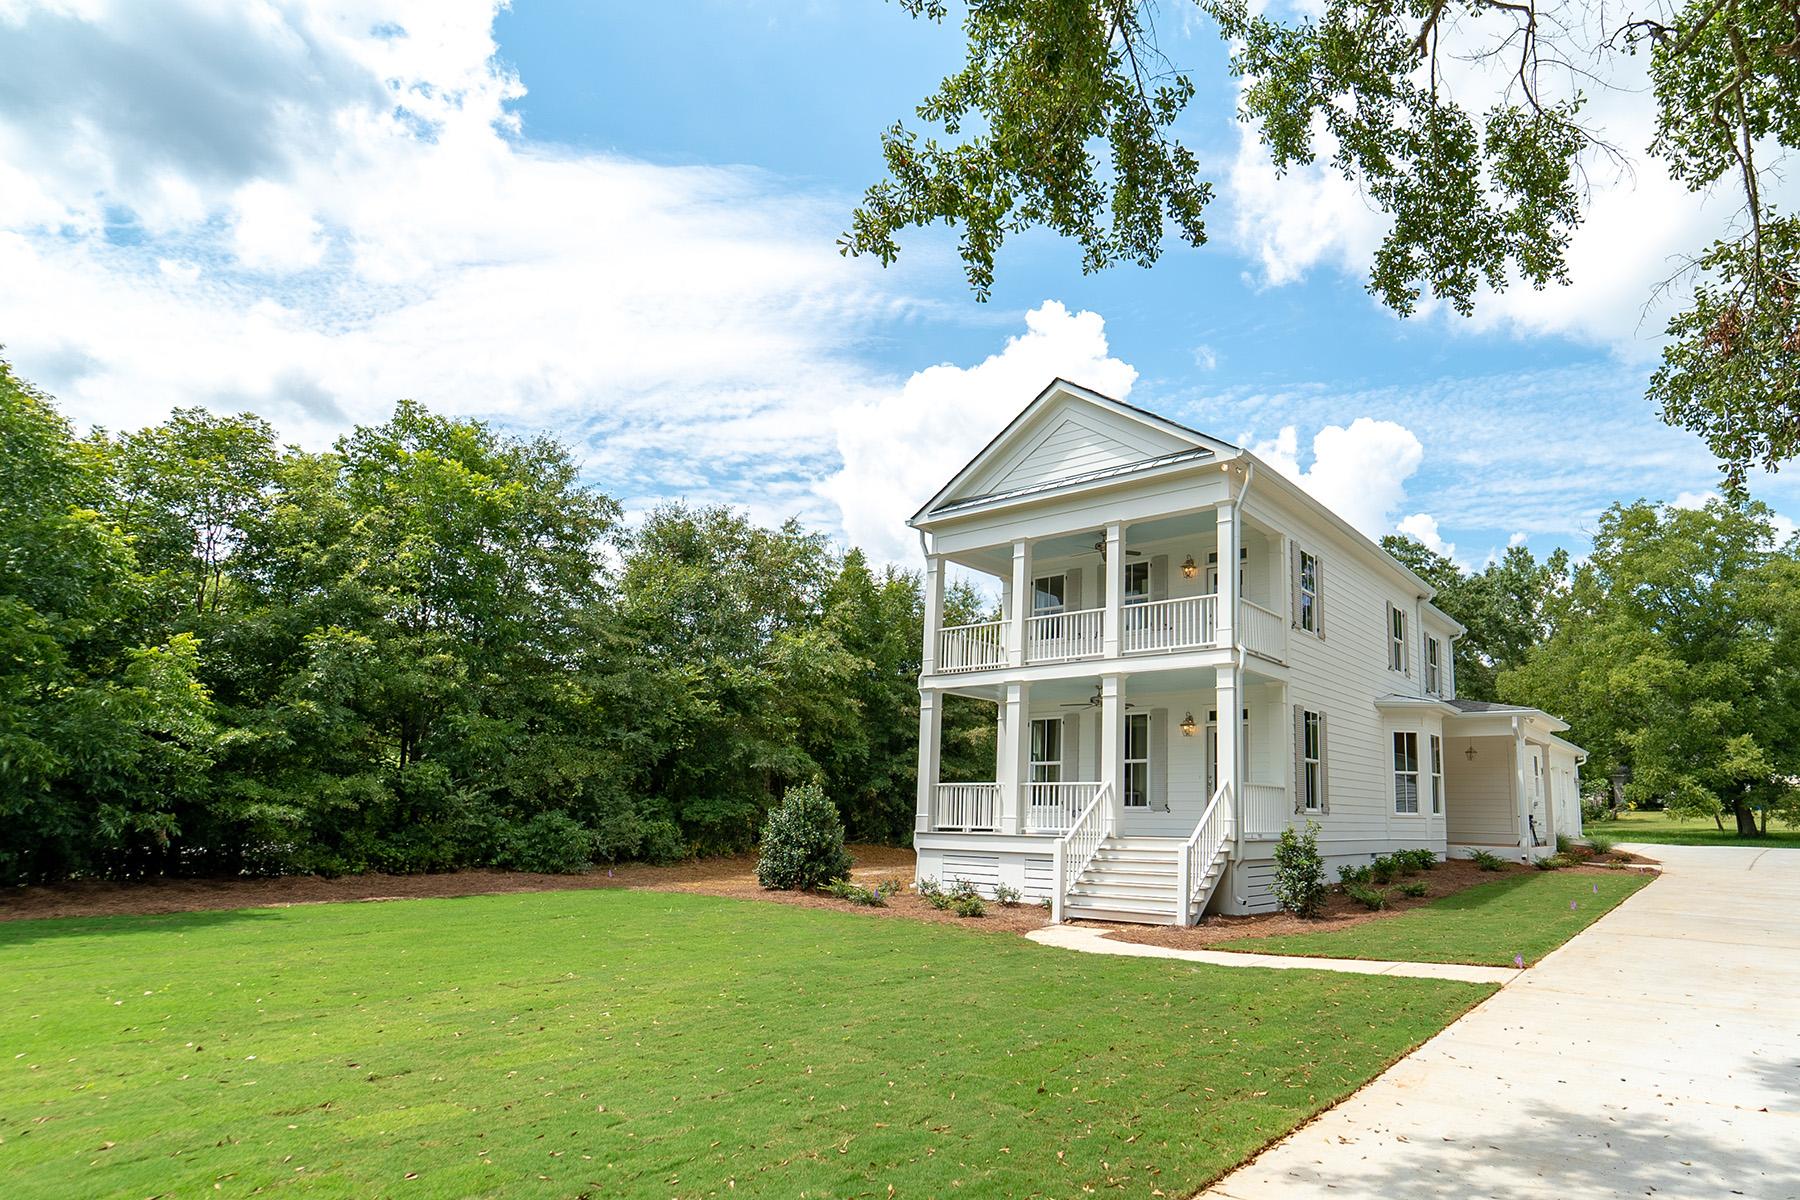 Single Family Homes for Active at Modern Farmhouse in The Historic Town of Senoia 400 Seavy Street Senoia, Georgia 30276 United States